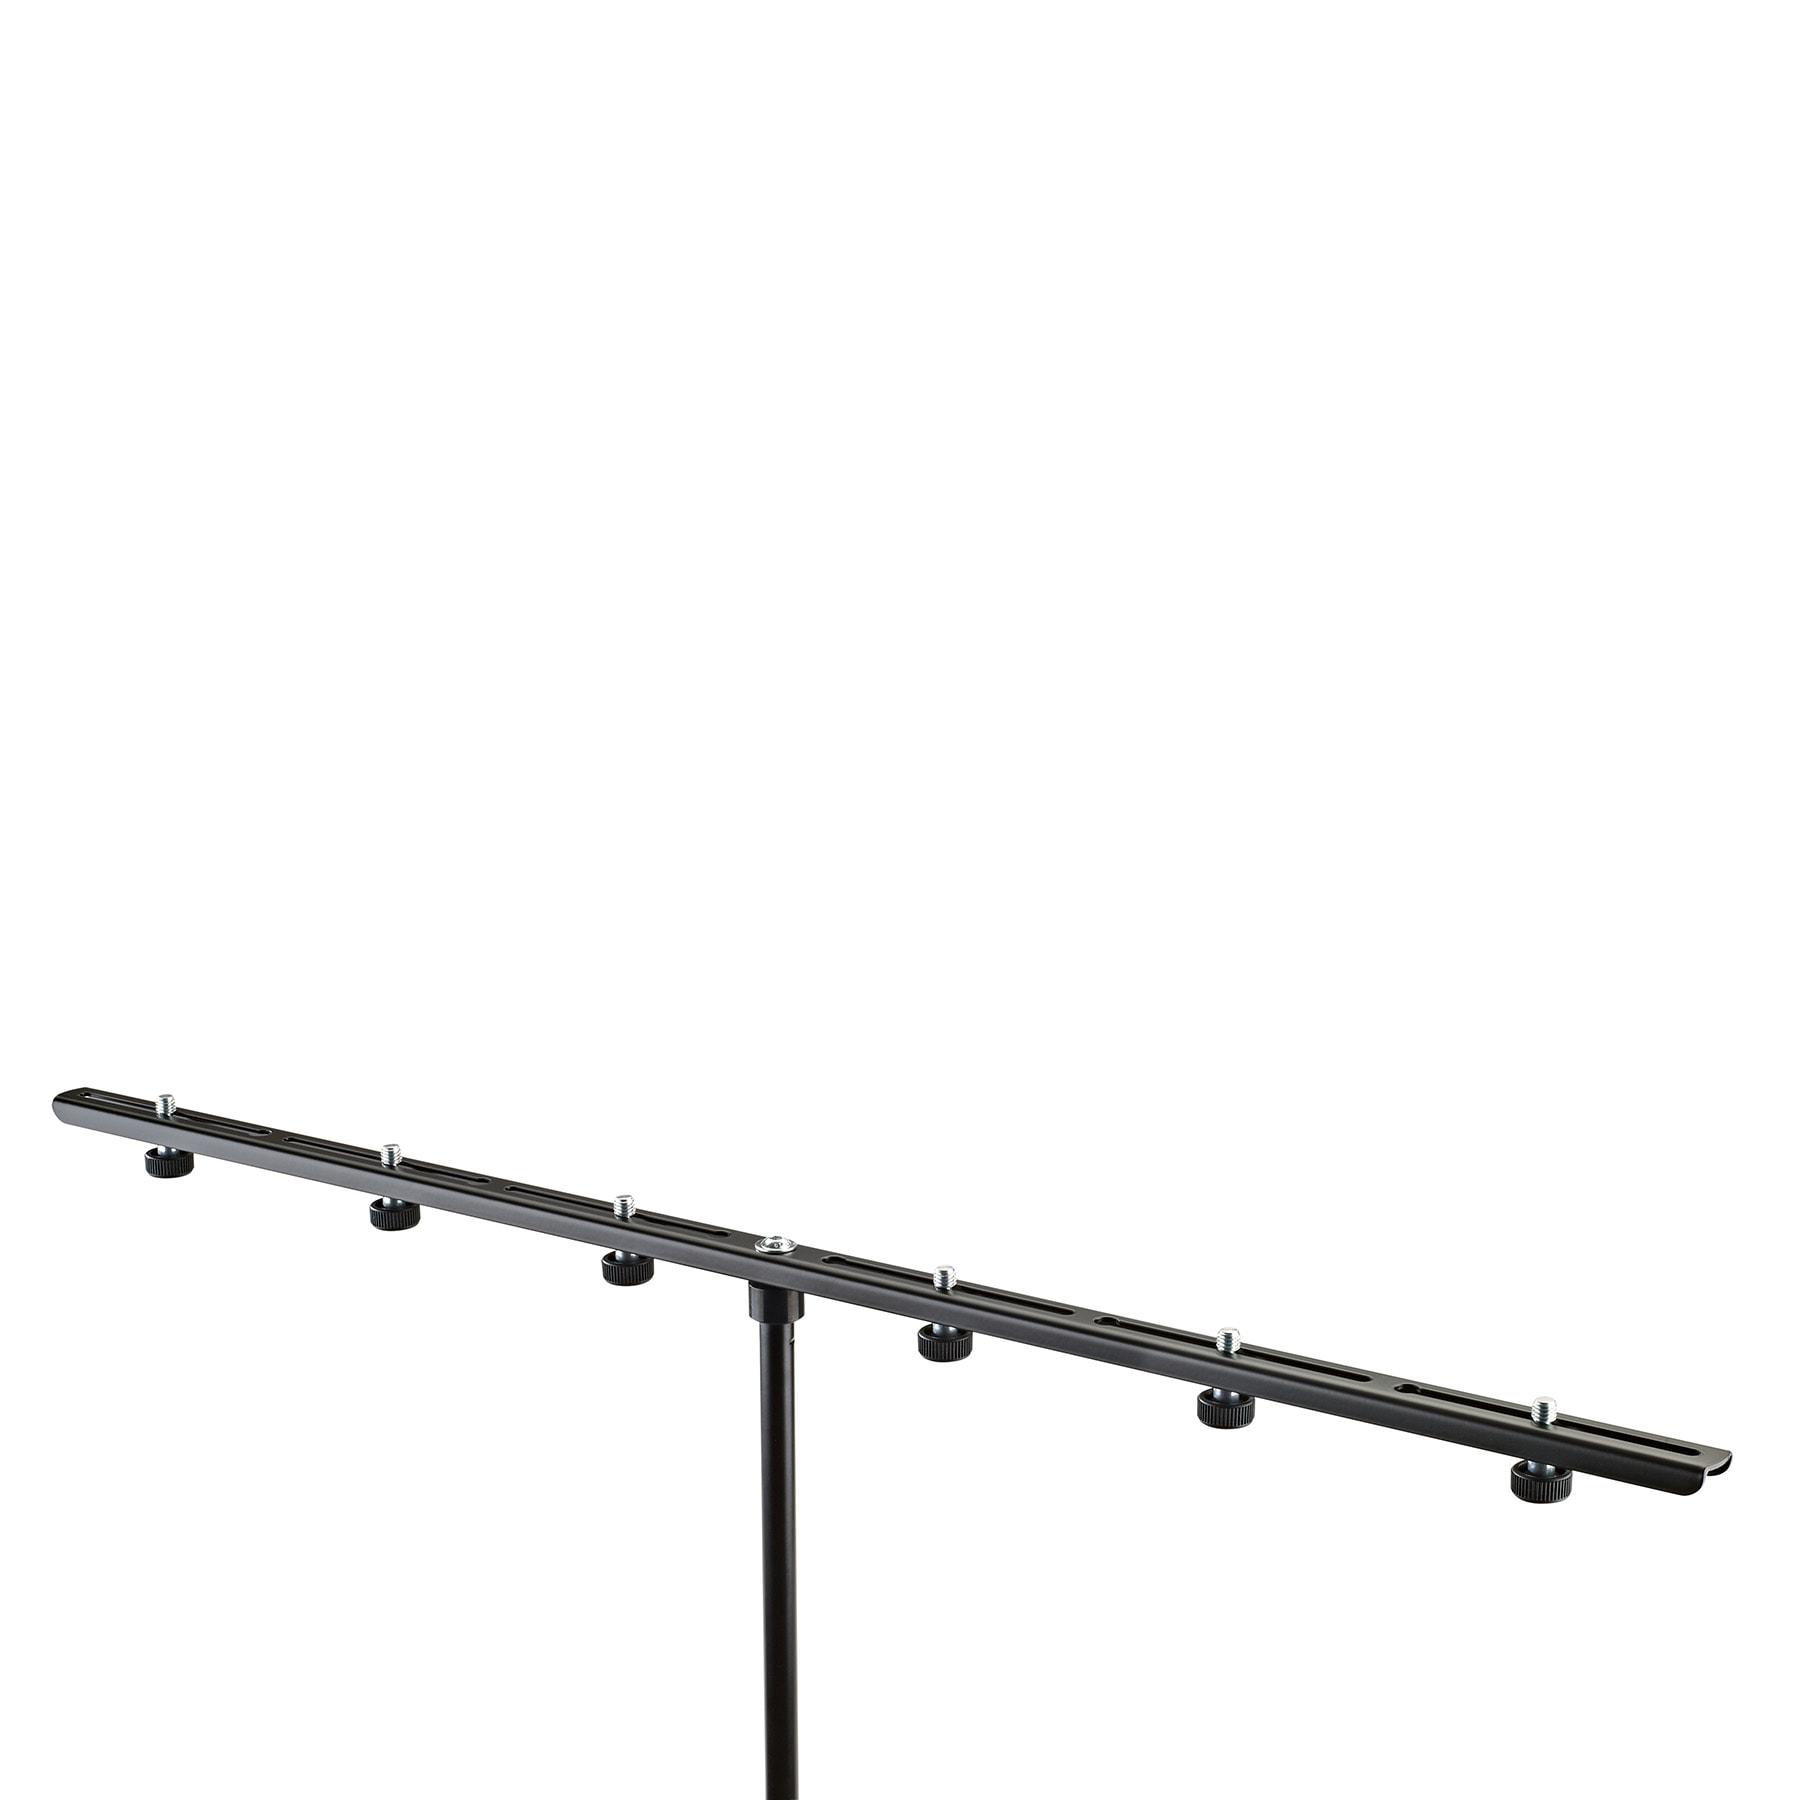 KM23560 - Microphone bar